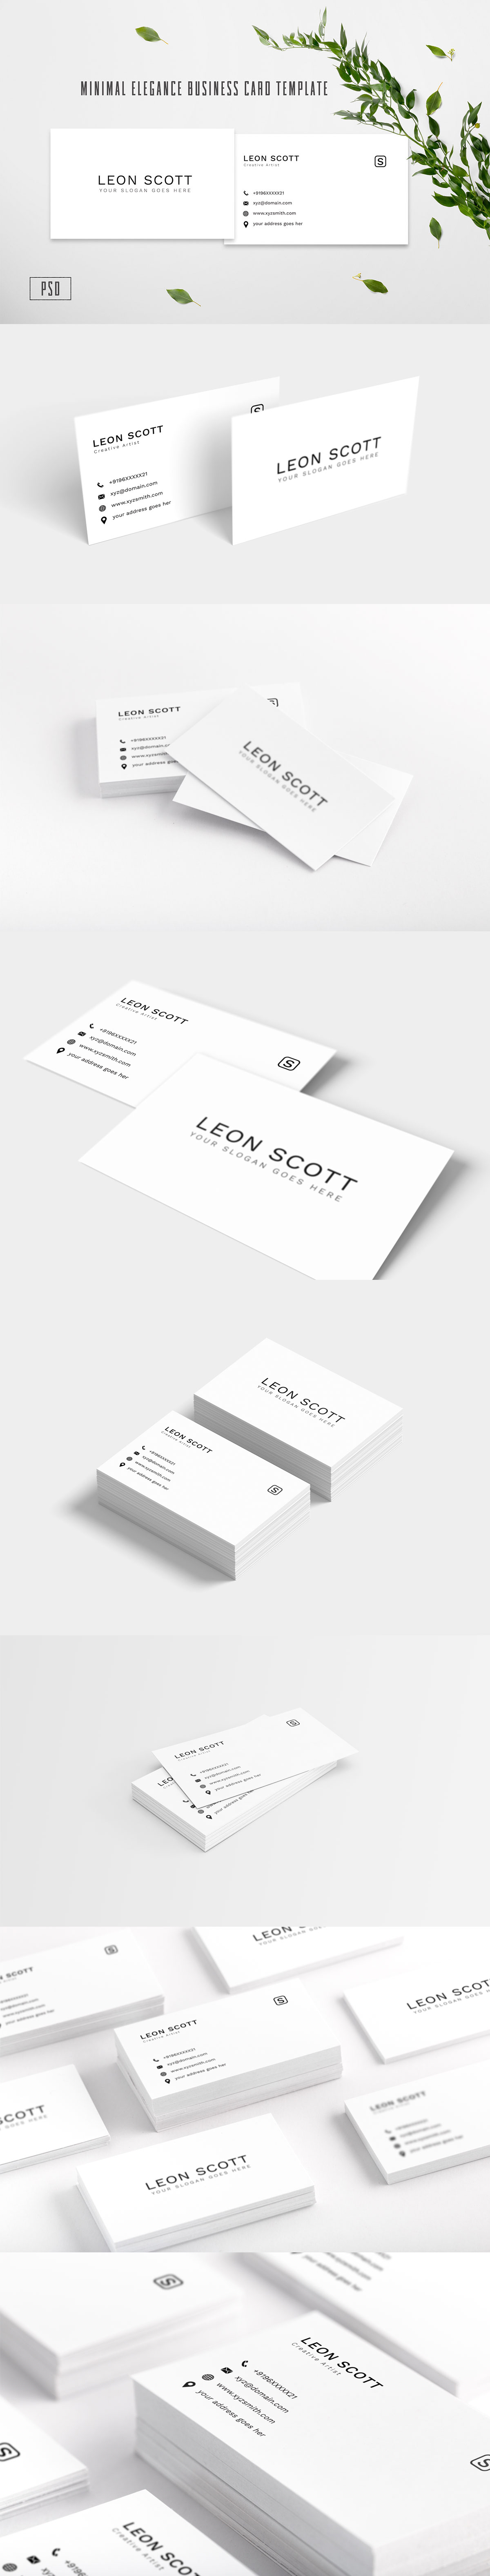 Free Minimal Elegance Business Card Template